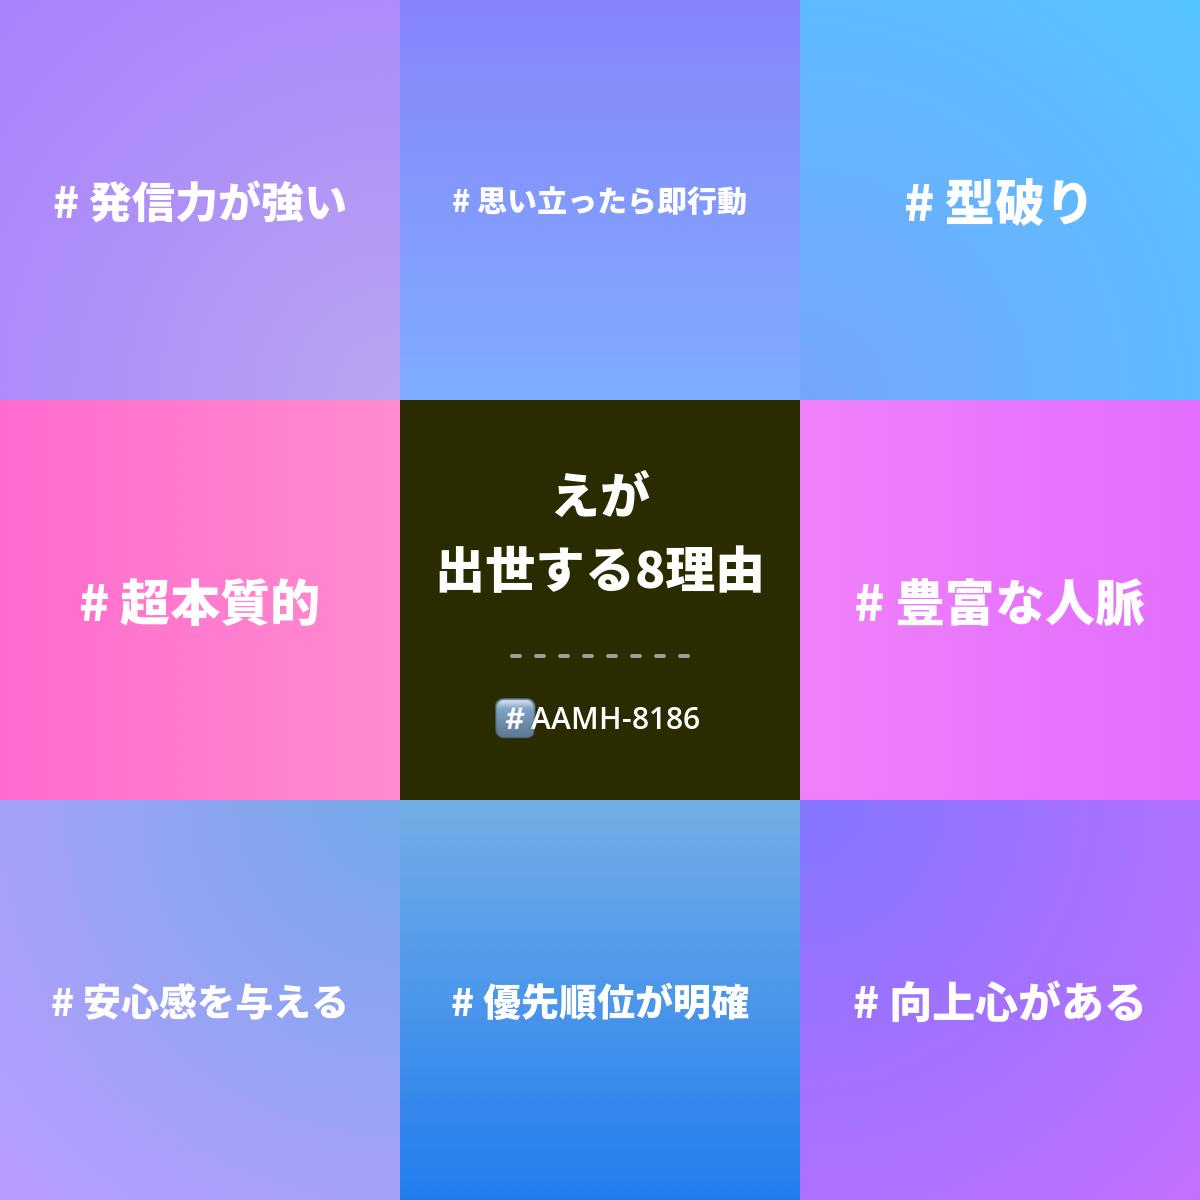 f:id:nagasaki-harikyusekkotsuin:20190724153244p:plain